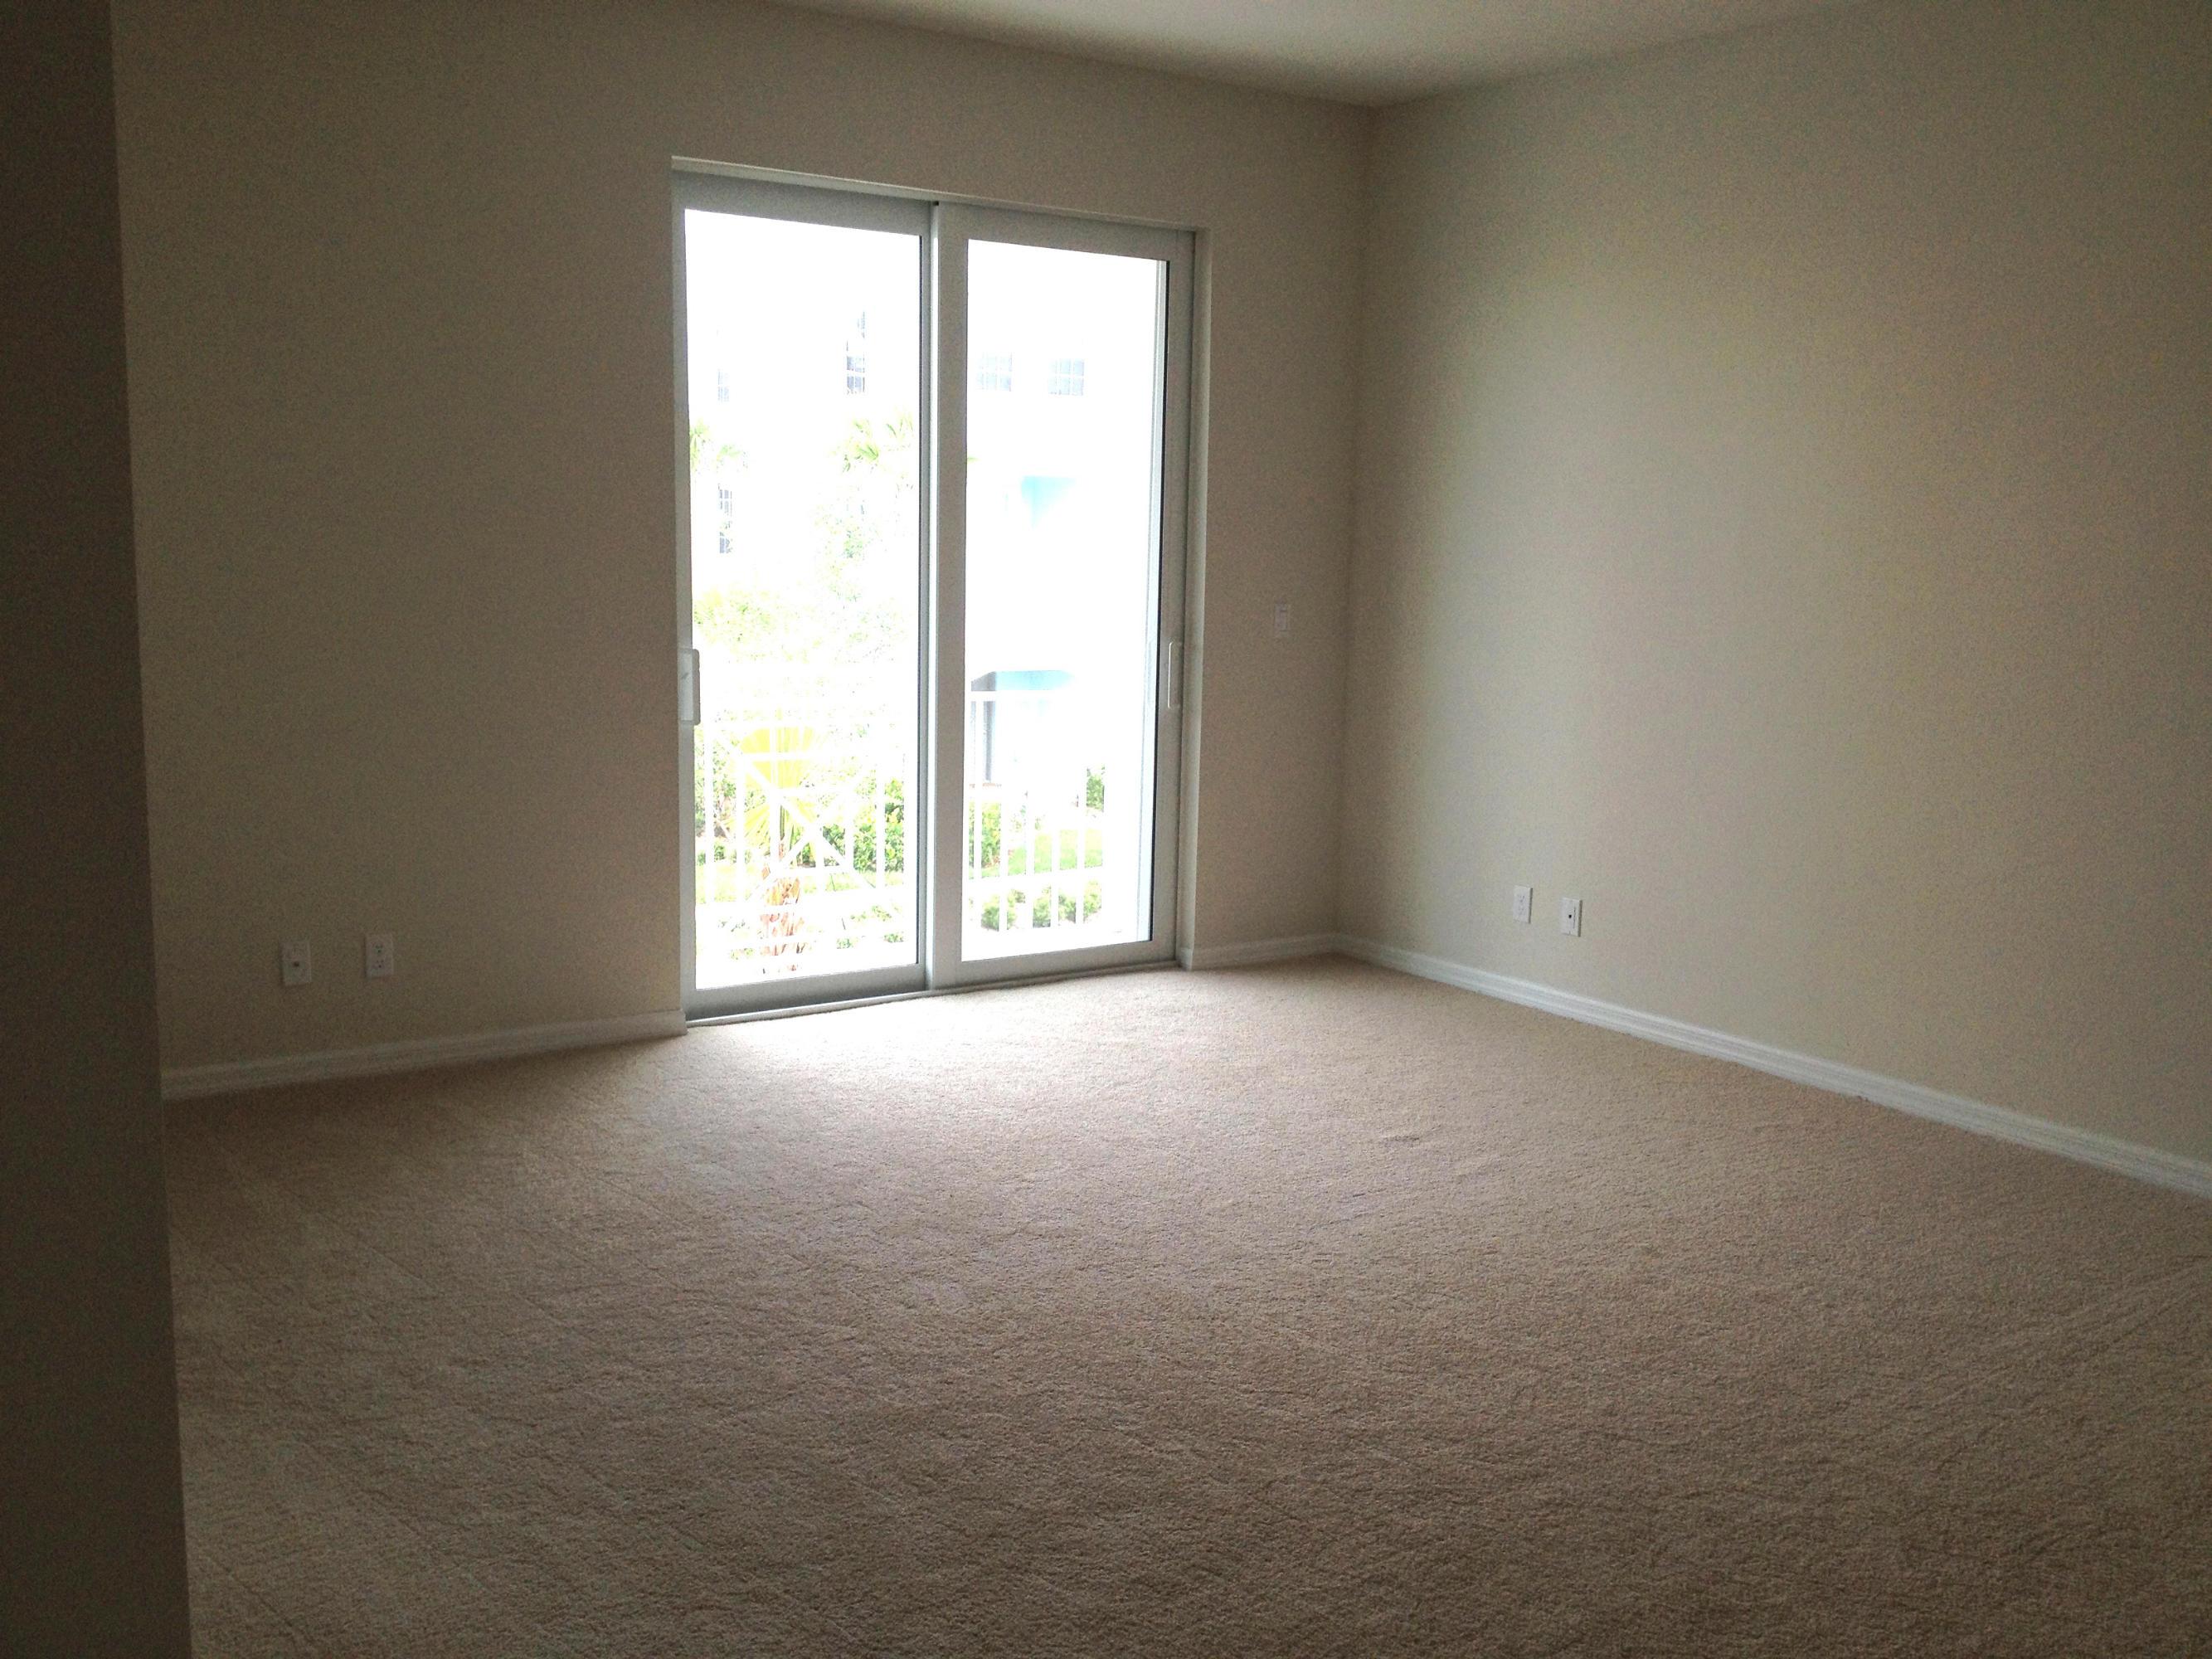 3242 Caroline Drive, Jupiter, Florida 33458, 3 Bedrooms Bedrooms, ,2.1 BathroomsBathrooms,F,Townhouse,Caroline,RX-10498295